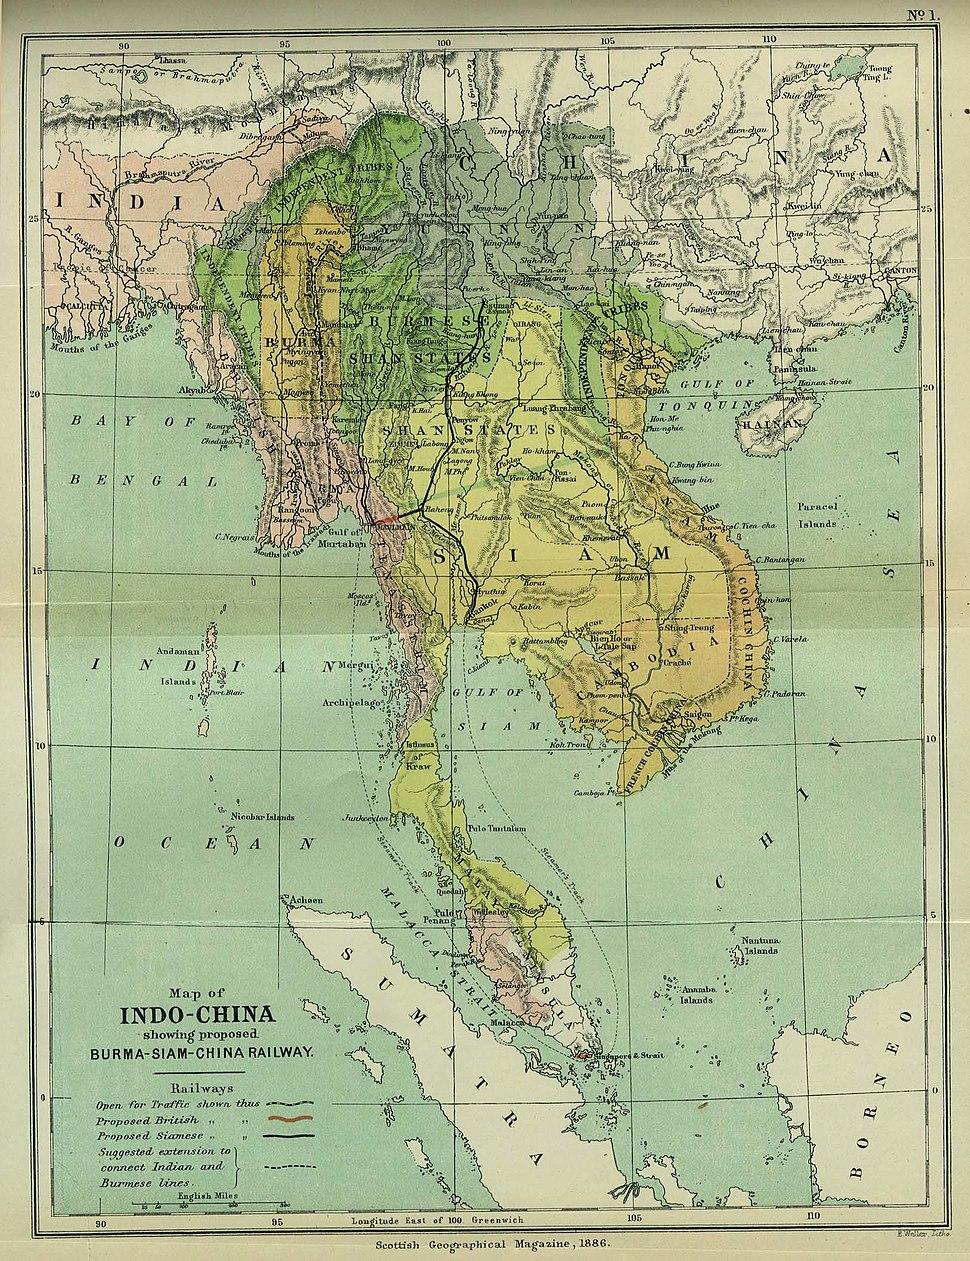 Indochina map 1886